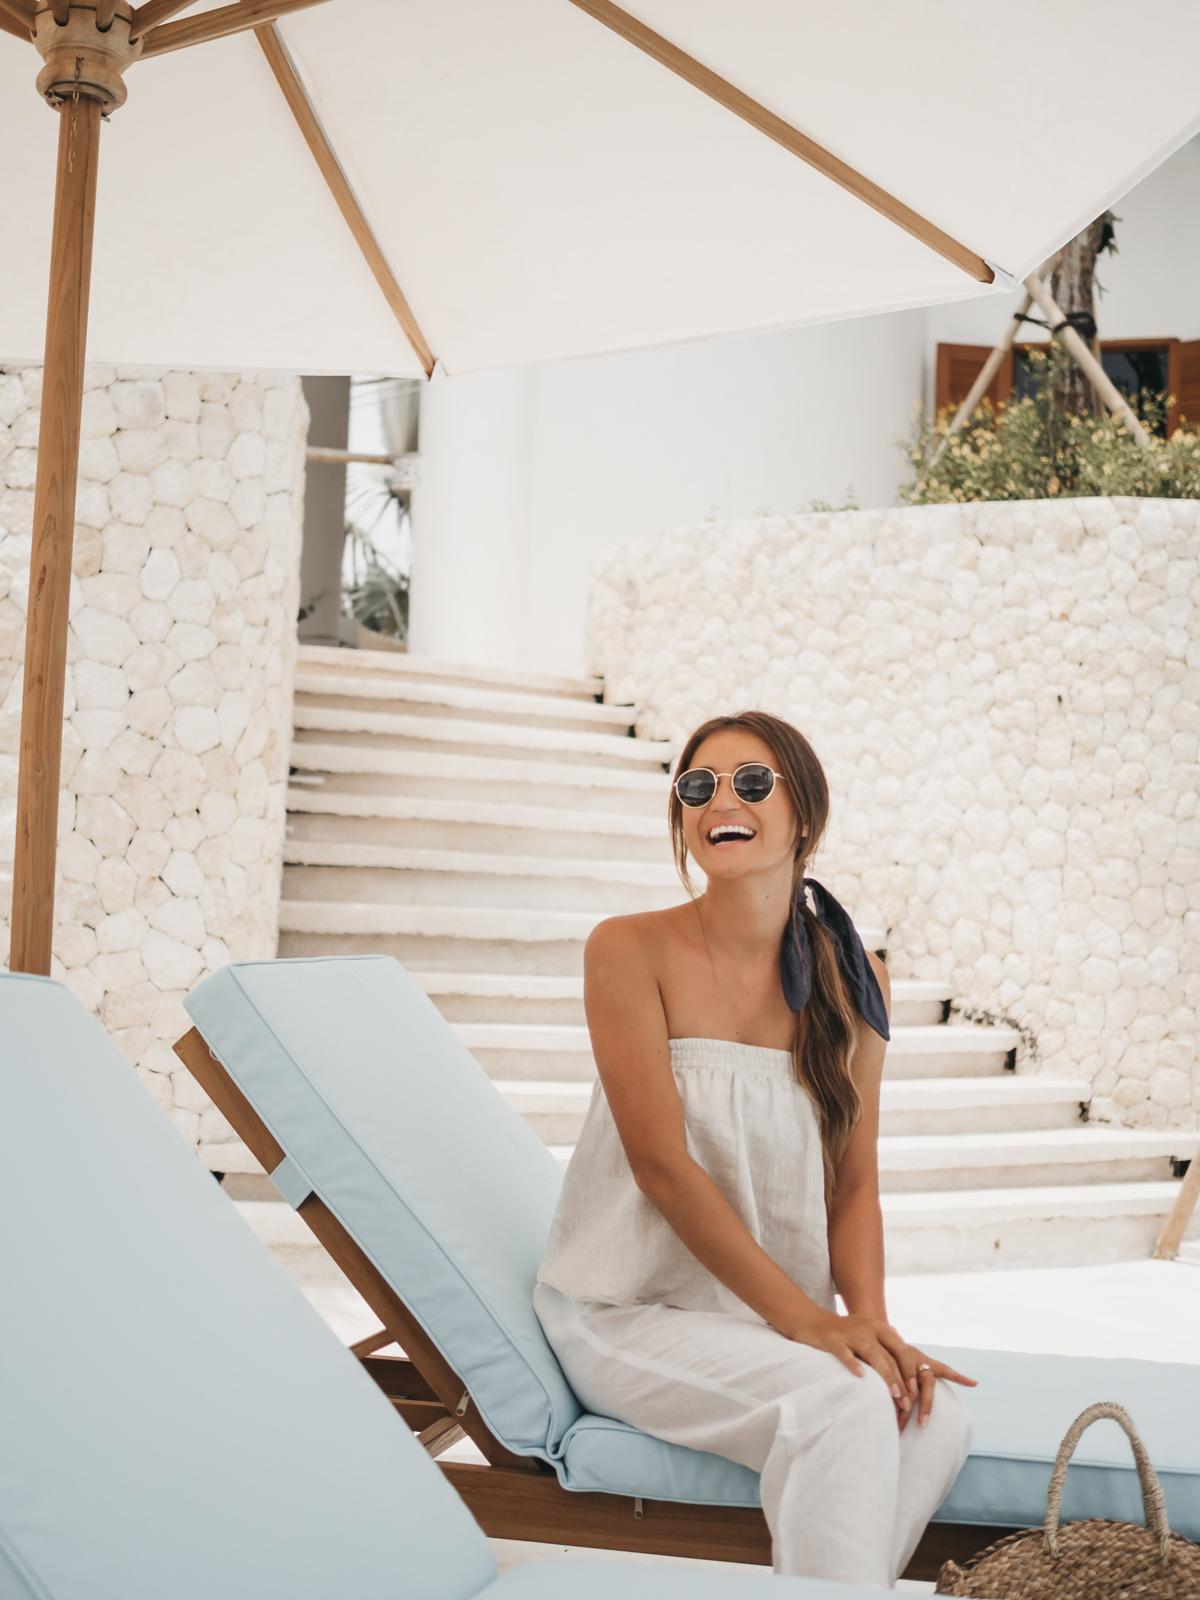 keira_mason+Vegan_resort_wear-8.jpg